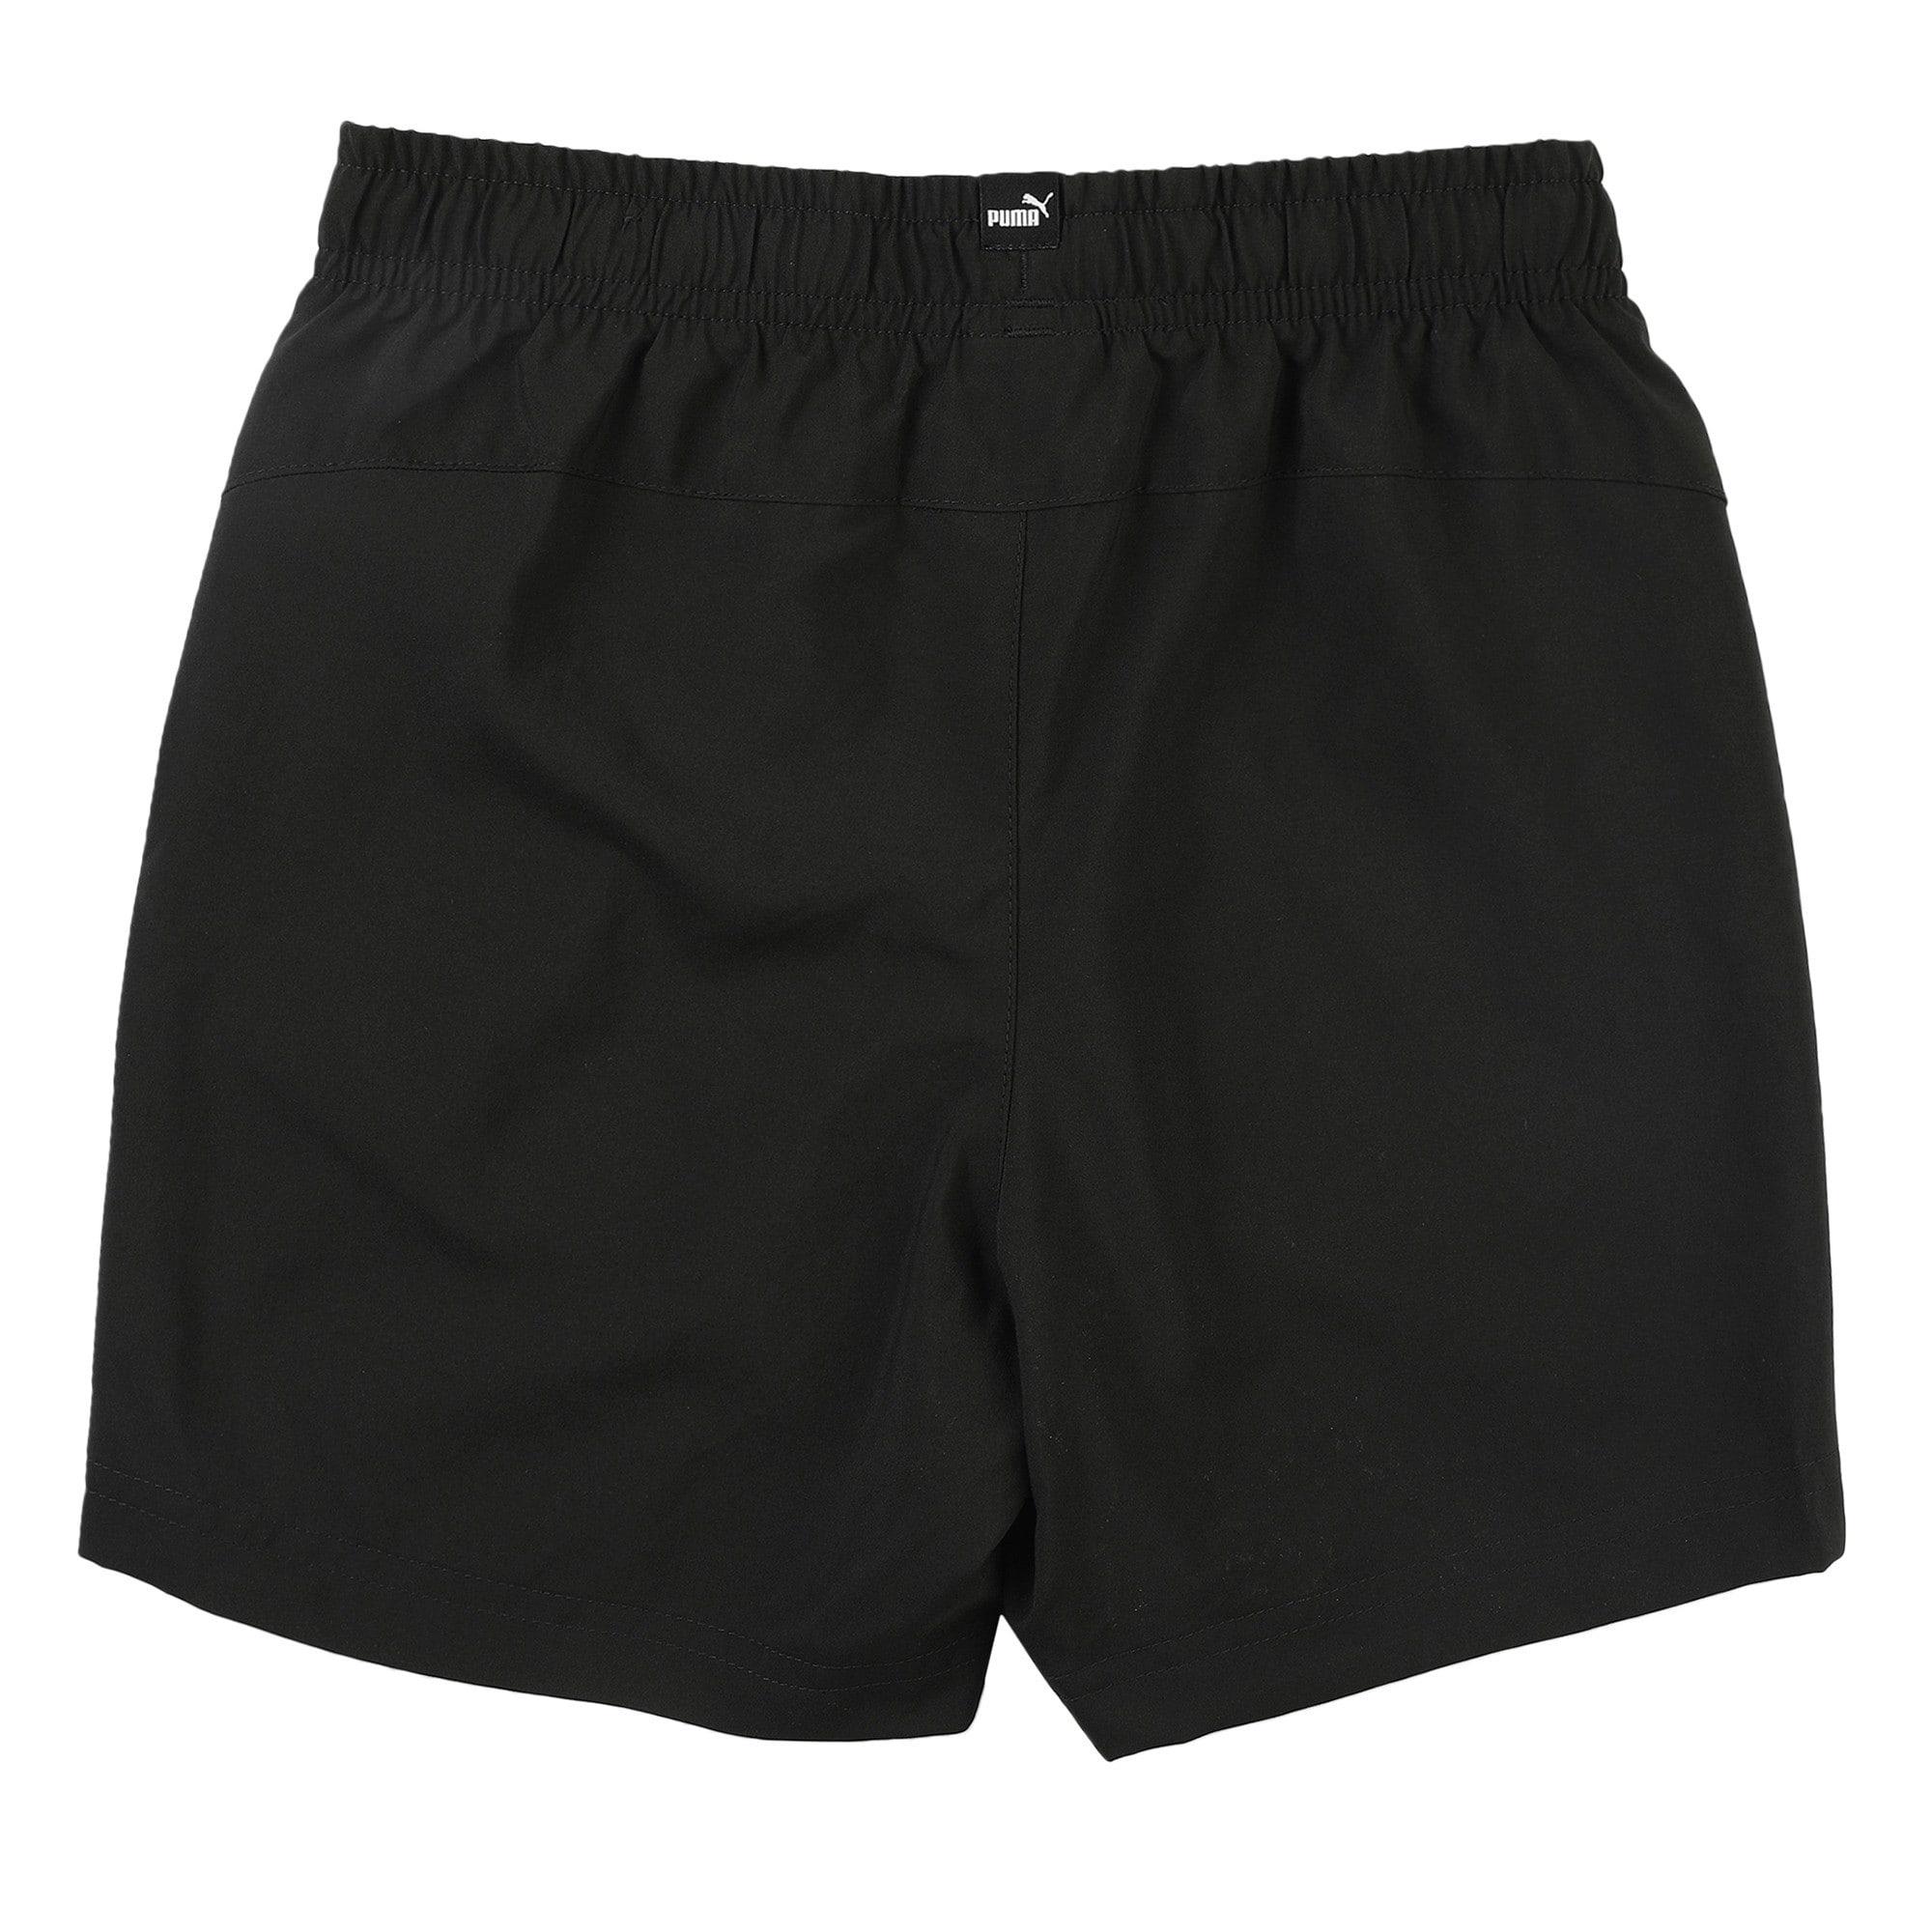 Thumbnail 3 of Essentials Woven Boys' Training Shorts, Puma Black, medium-IND